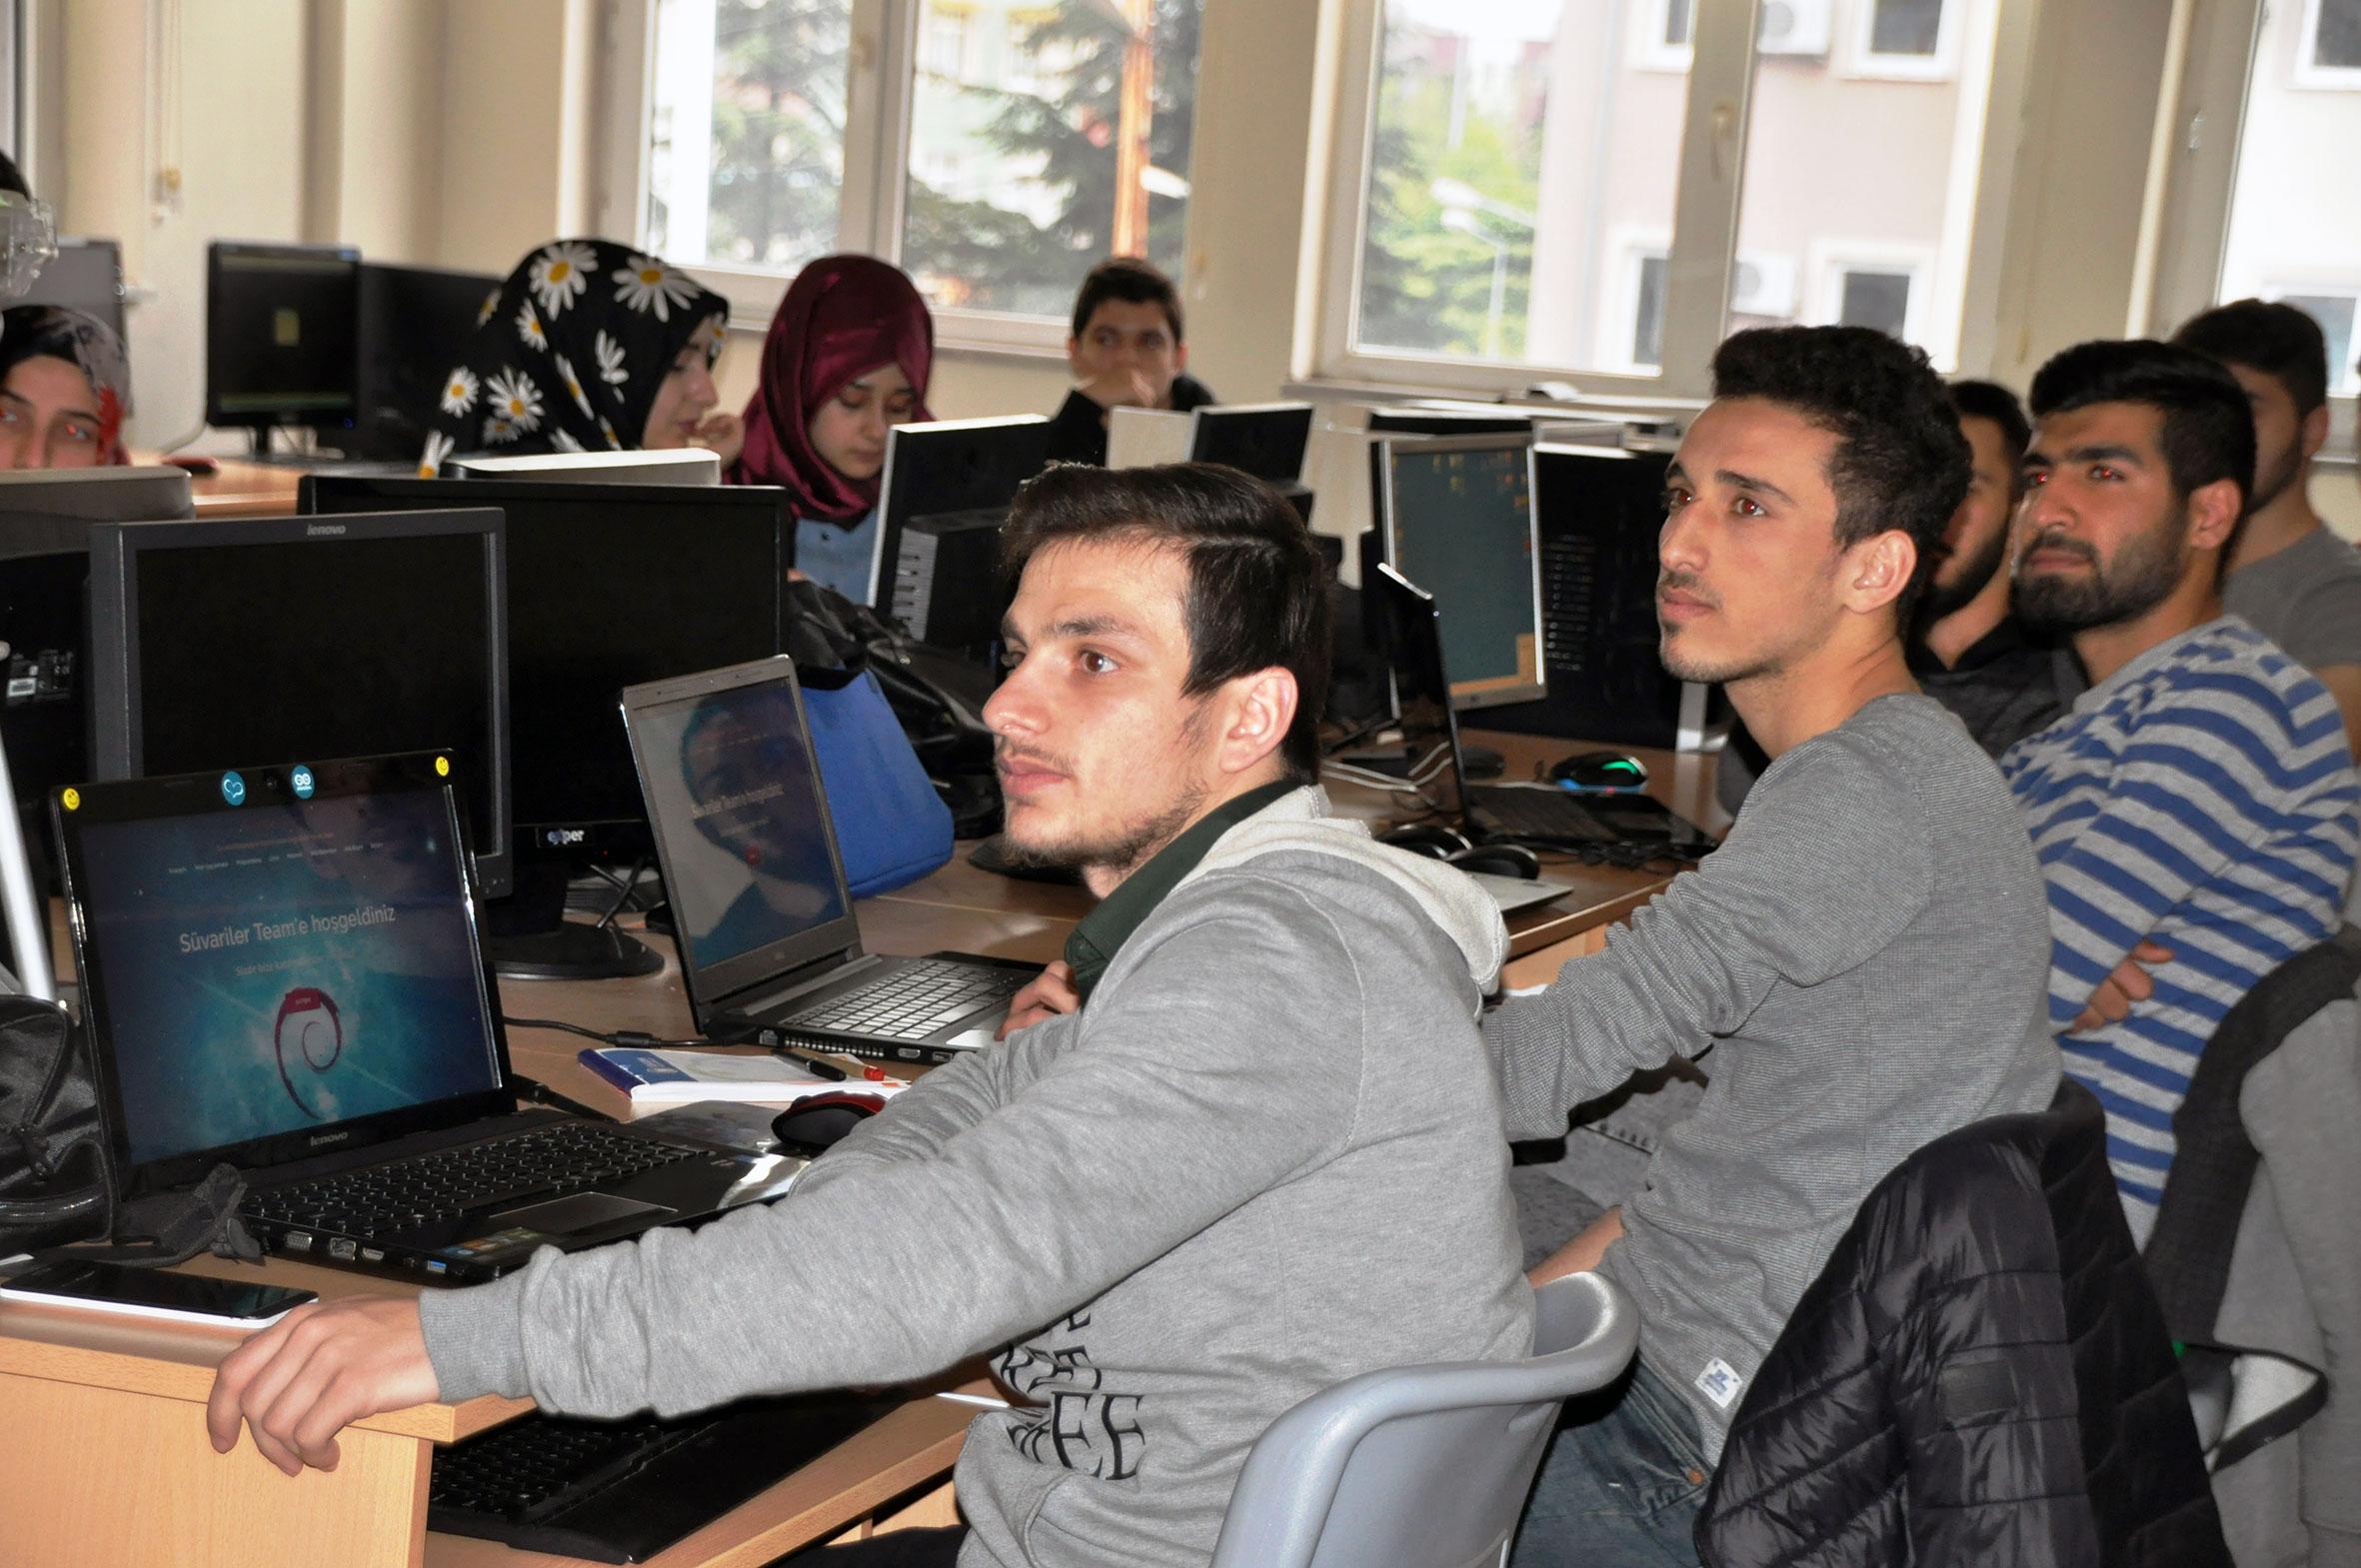 http://www.omu.edu.tr/sites/default/files/files/omu_hacker_kampa_ev_sahipligi_yapti/1_hackercamp2017.jpg